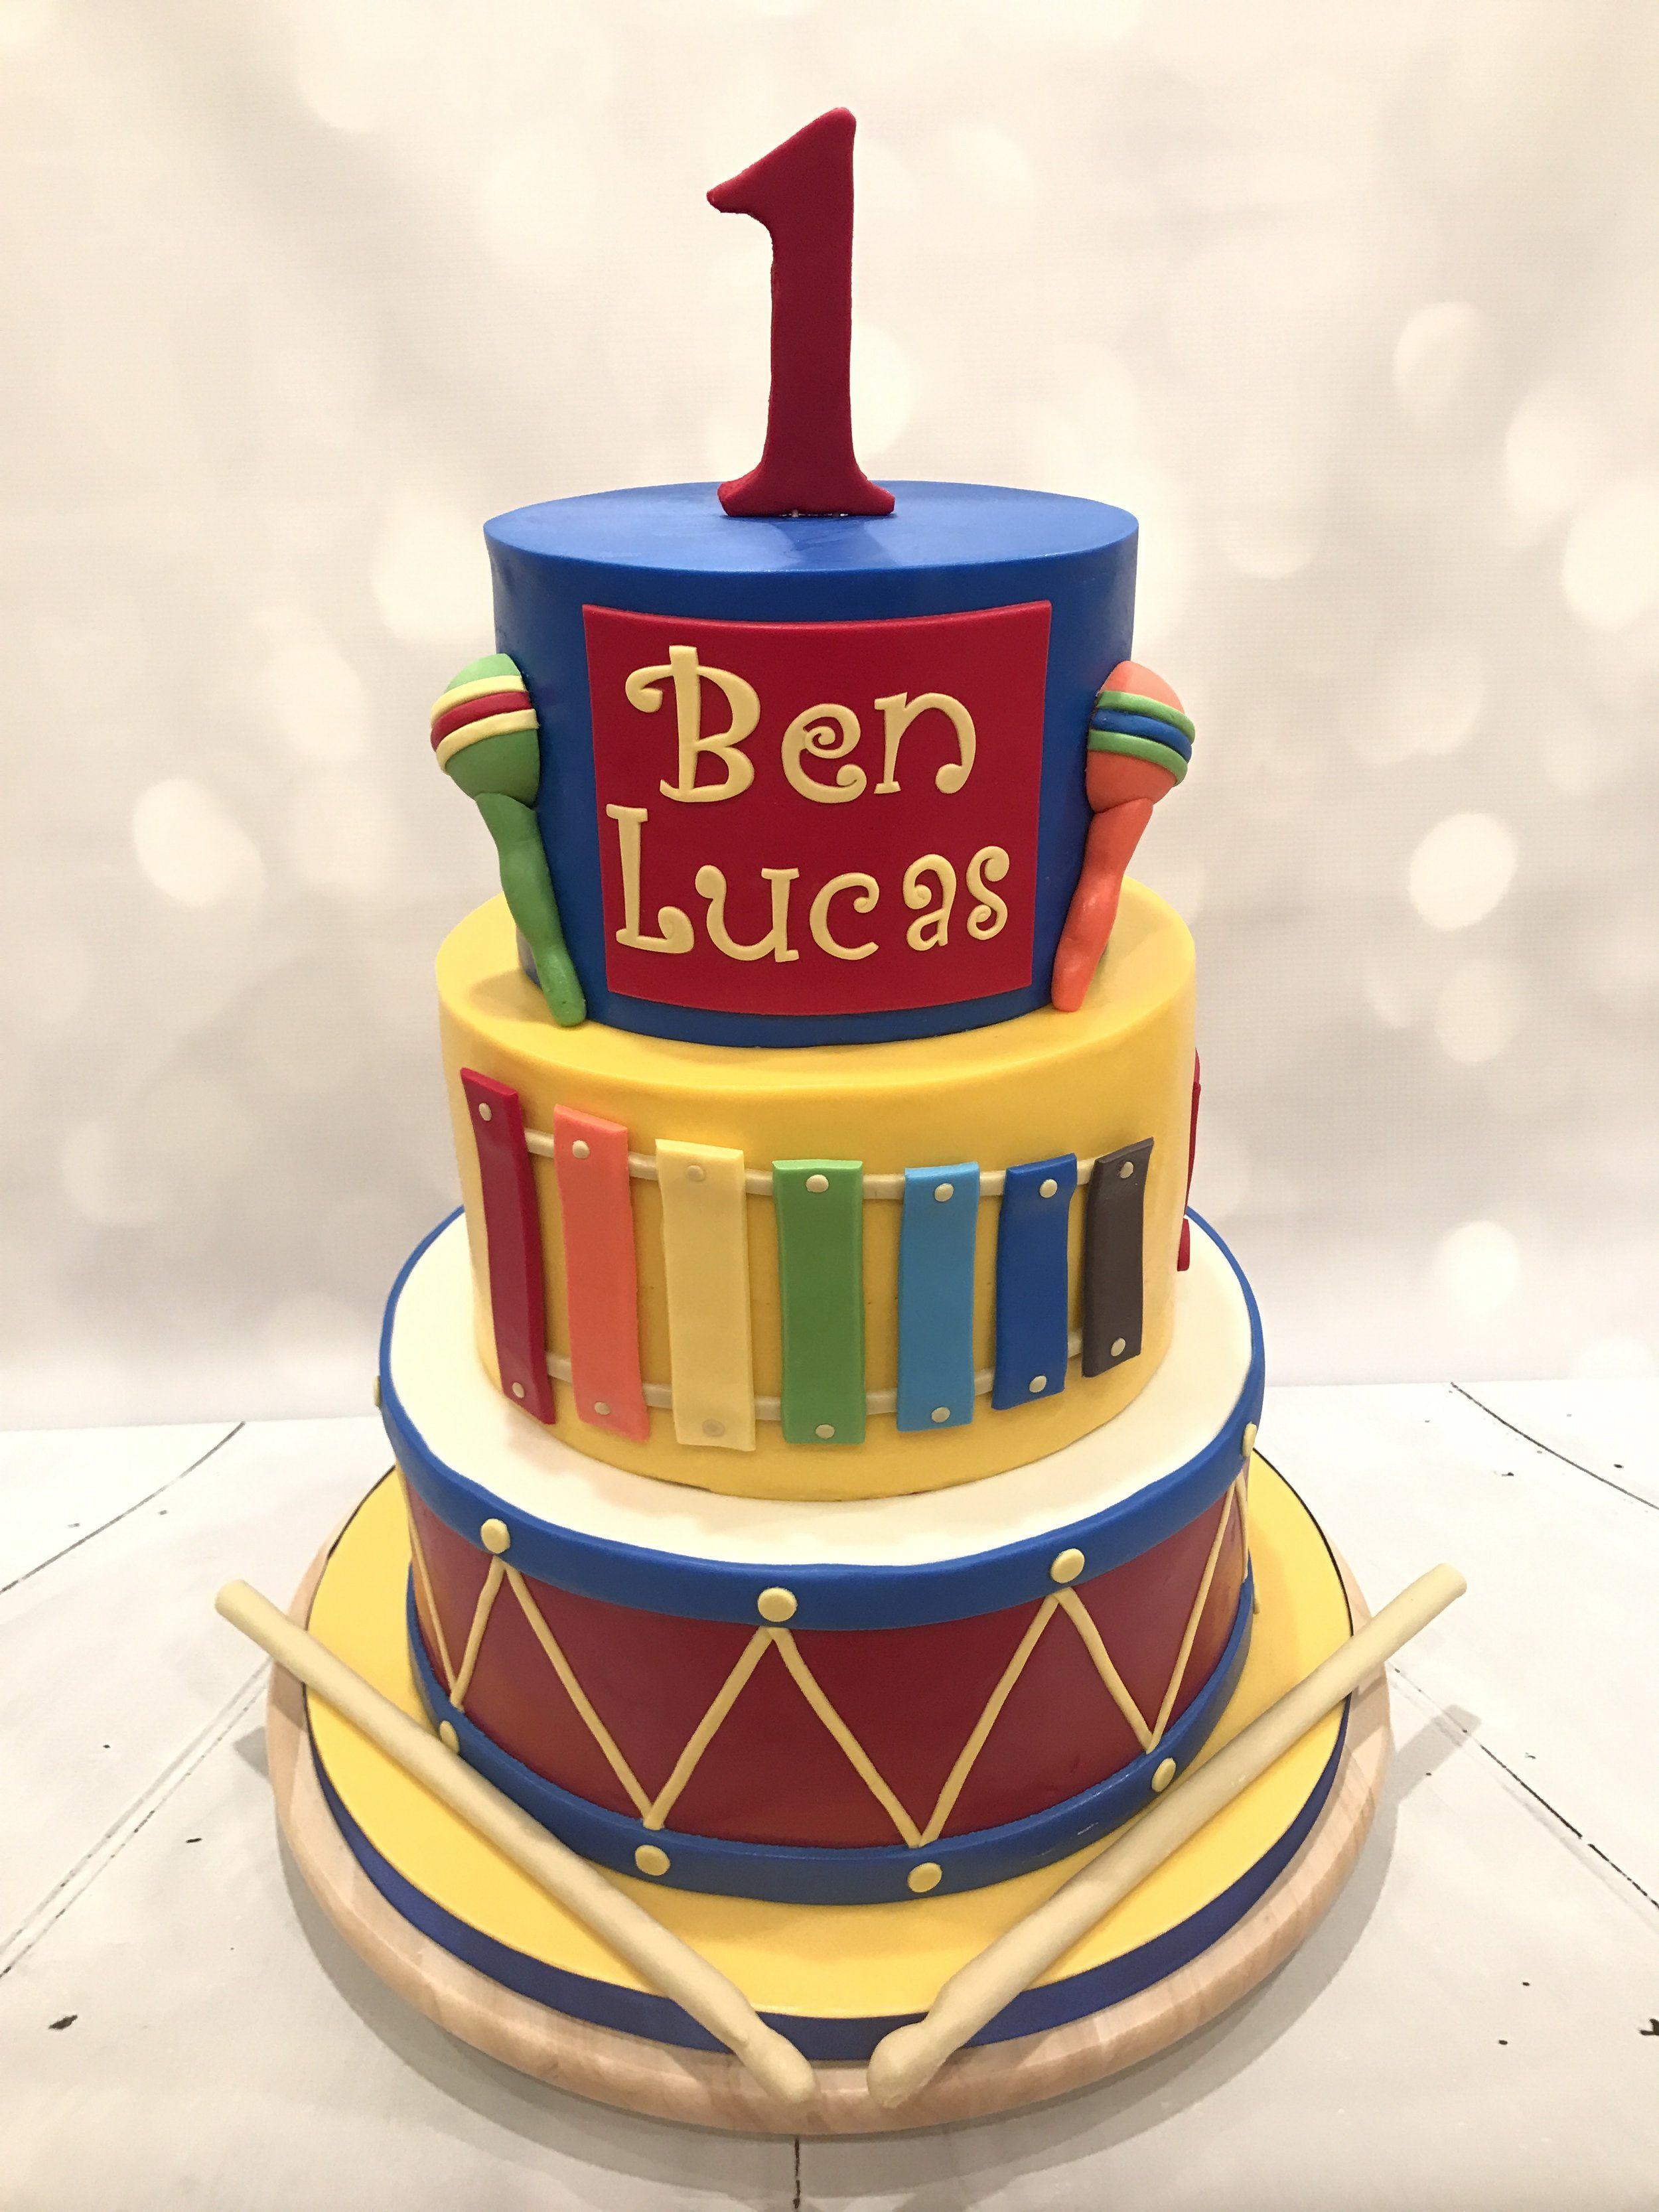 Tremendous Baby Jam Toddler Music Cake With Images Music Birthday Cakes Birthday Cards Printable Benkemecafe Filternl